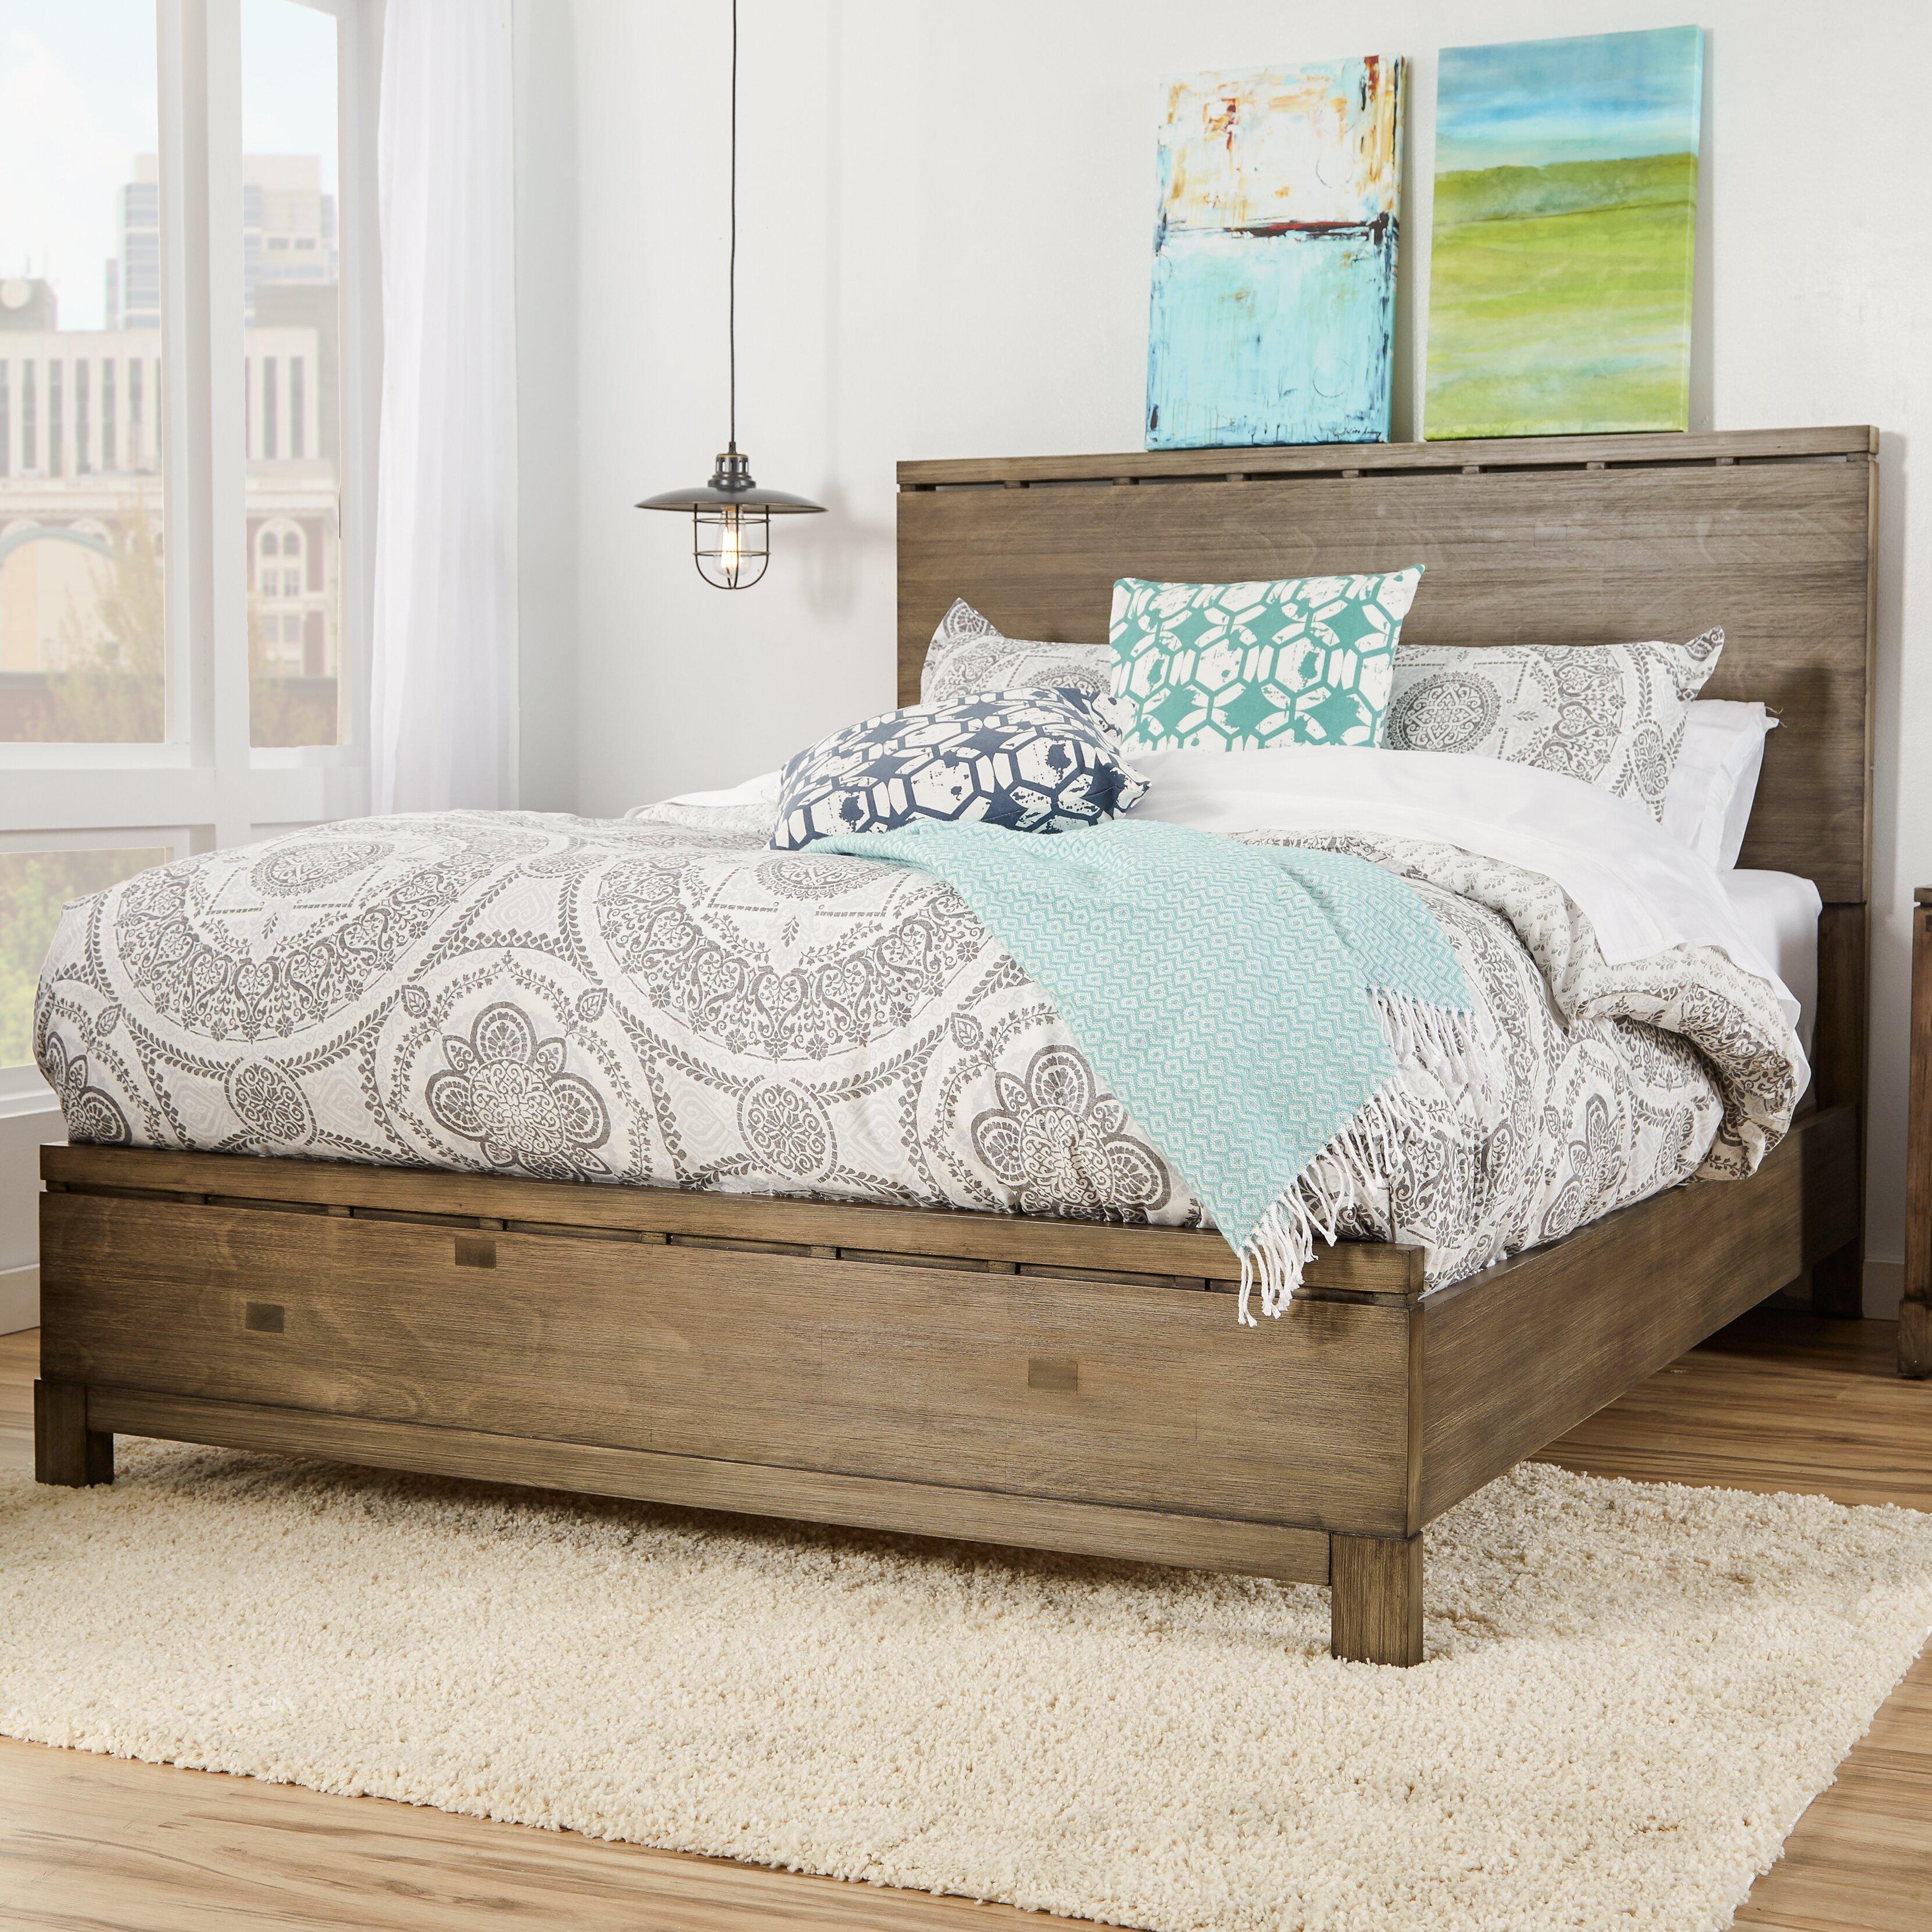 Mercury row pax panel bed reviews wayfair for Panel bed mattress